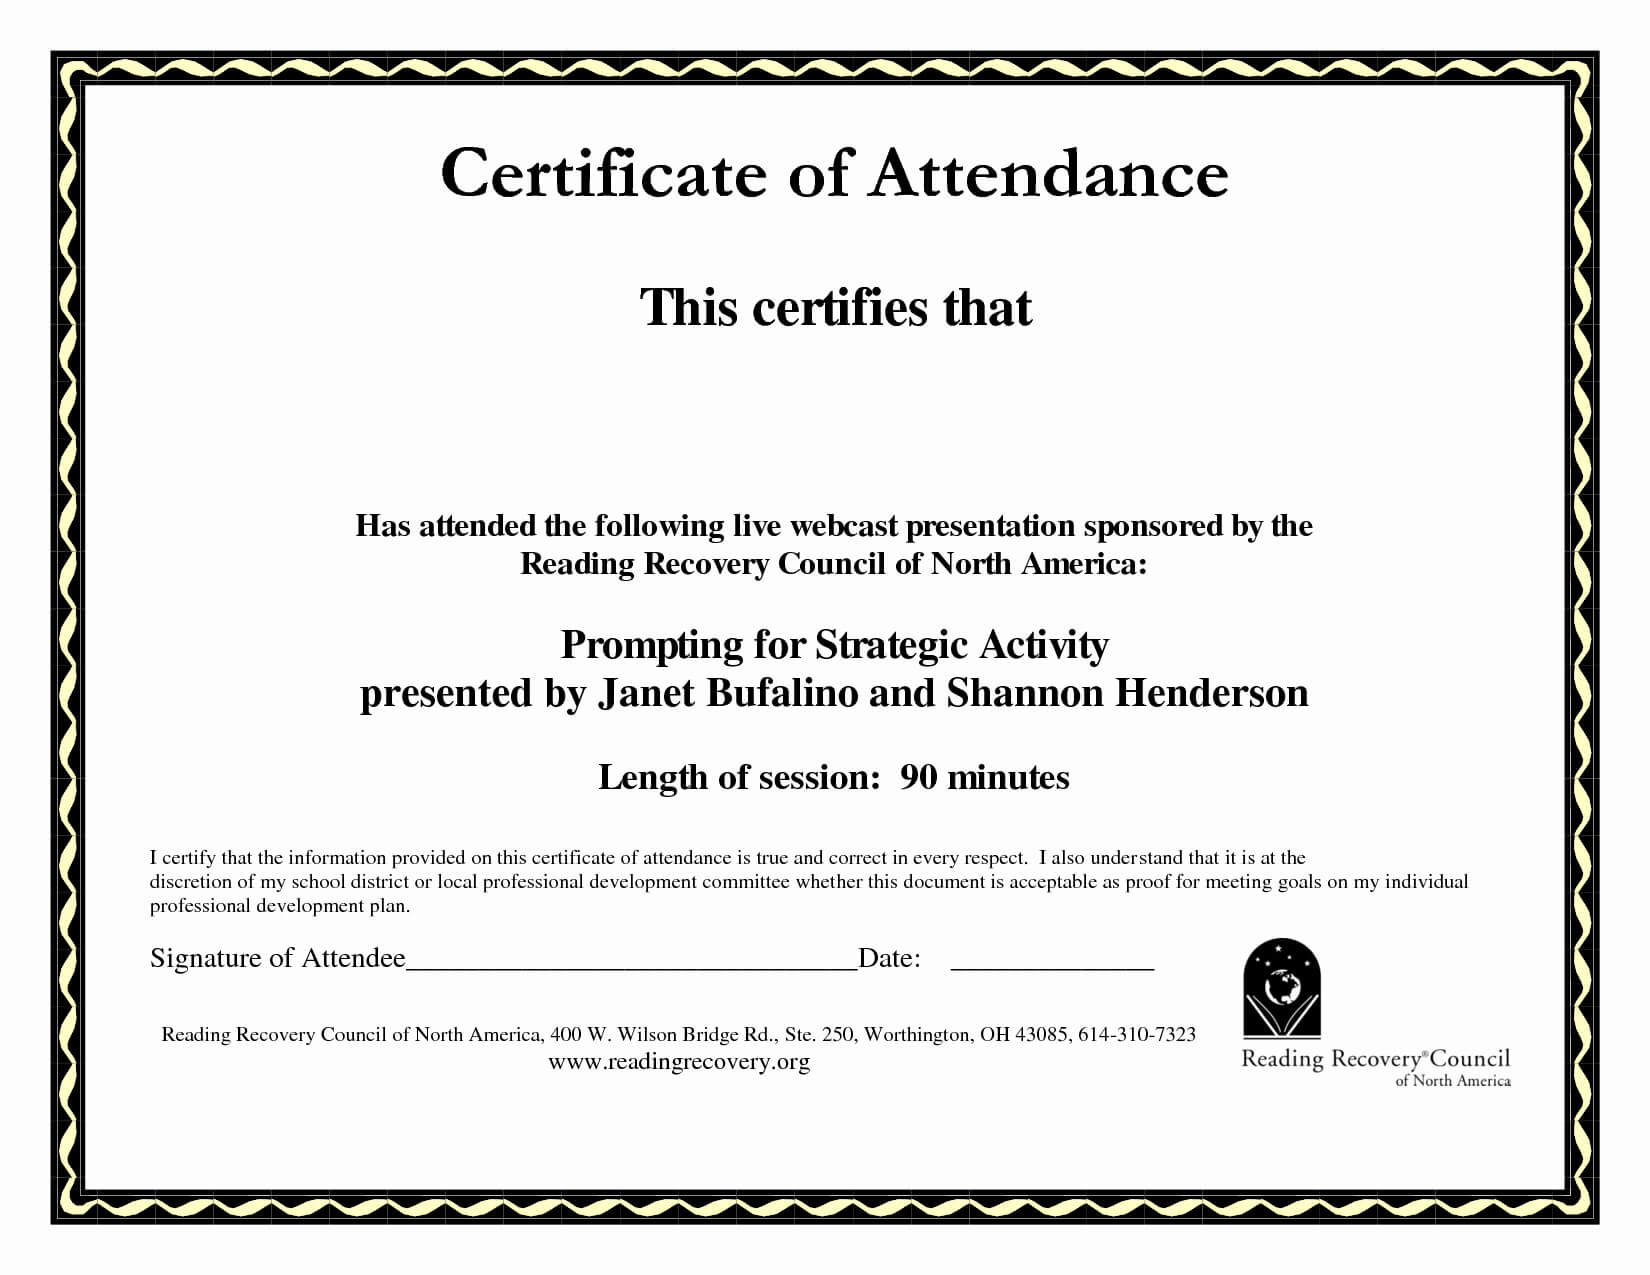 30 Ceu Certificate Of Attendance Template   Pryncepality throughout Conference Certificate Of Attendance Template